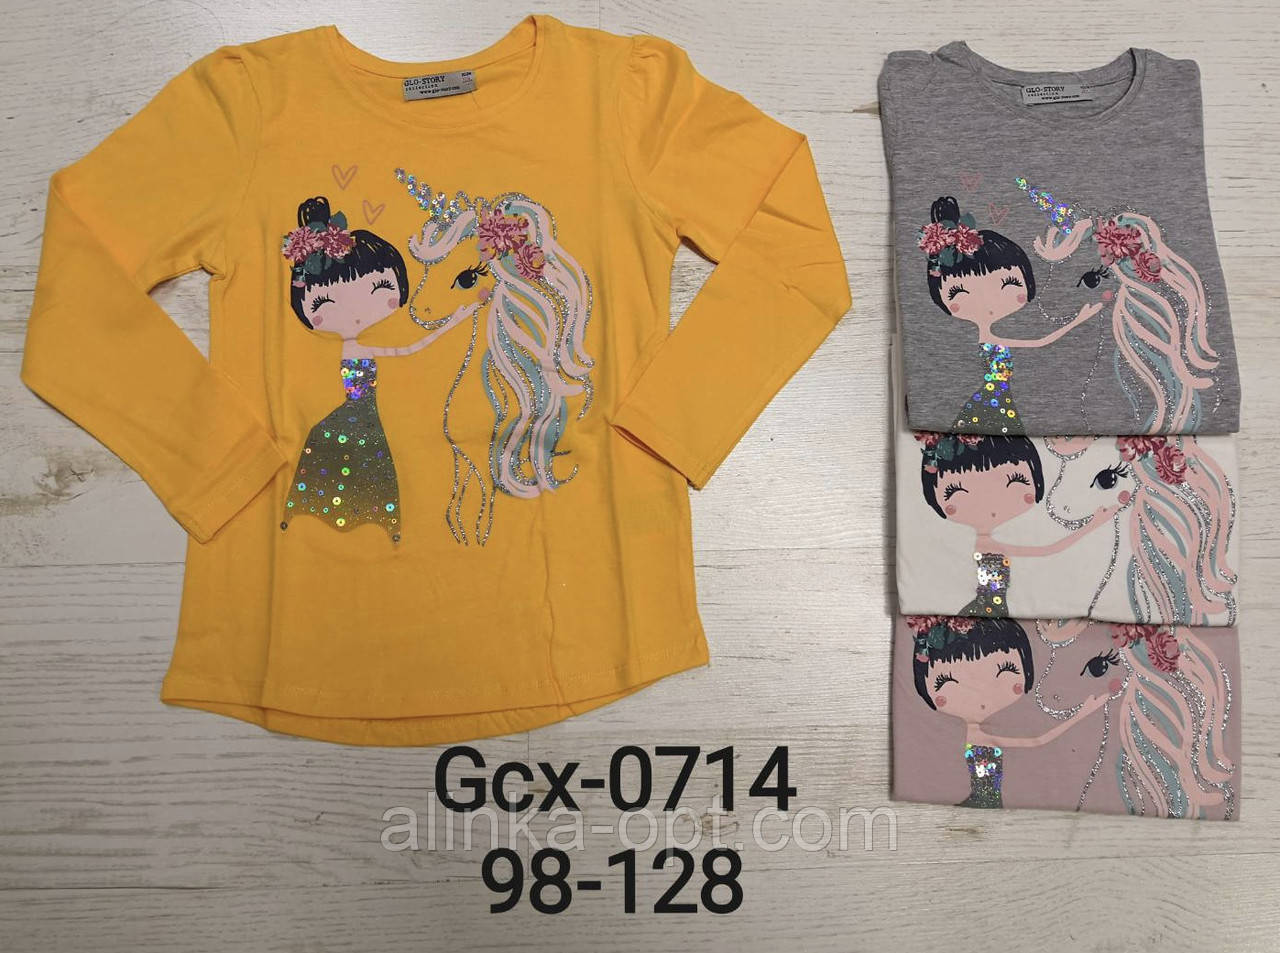 Трикотажный реглан для девочек Glo-Story, 98-128 рр. Артикул: GCX0714